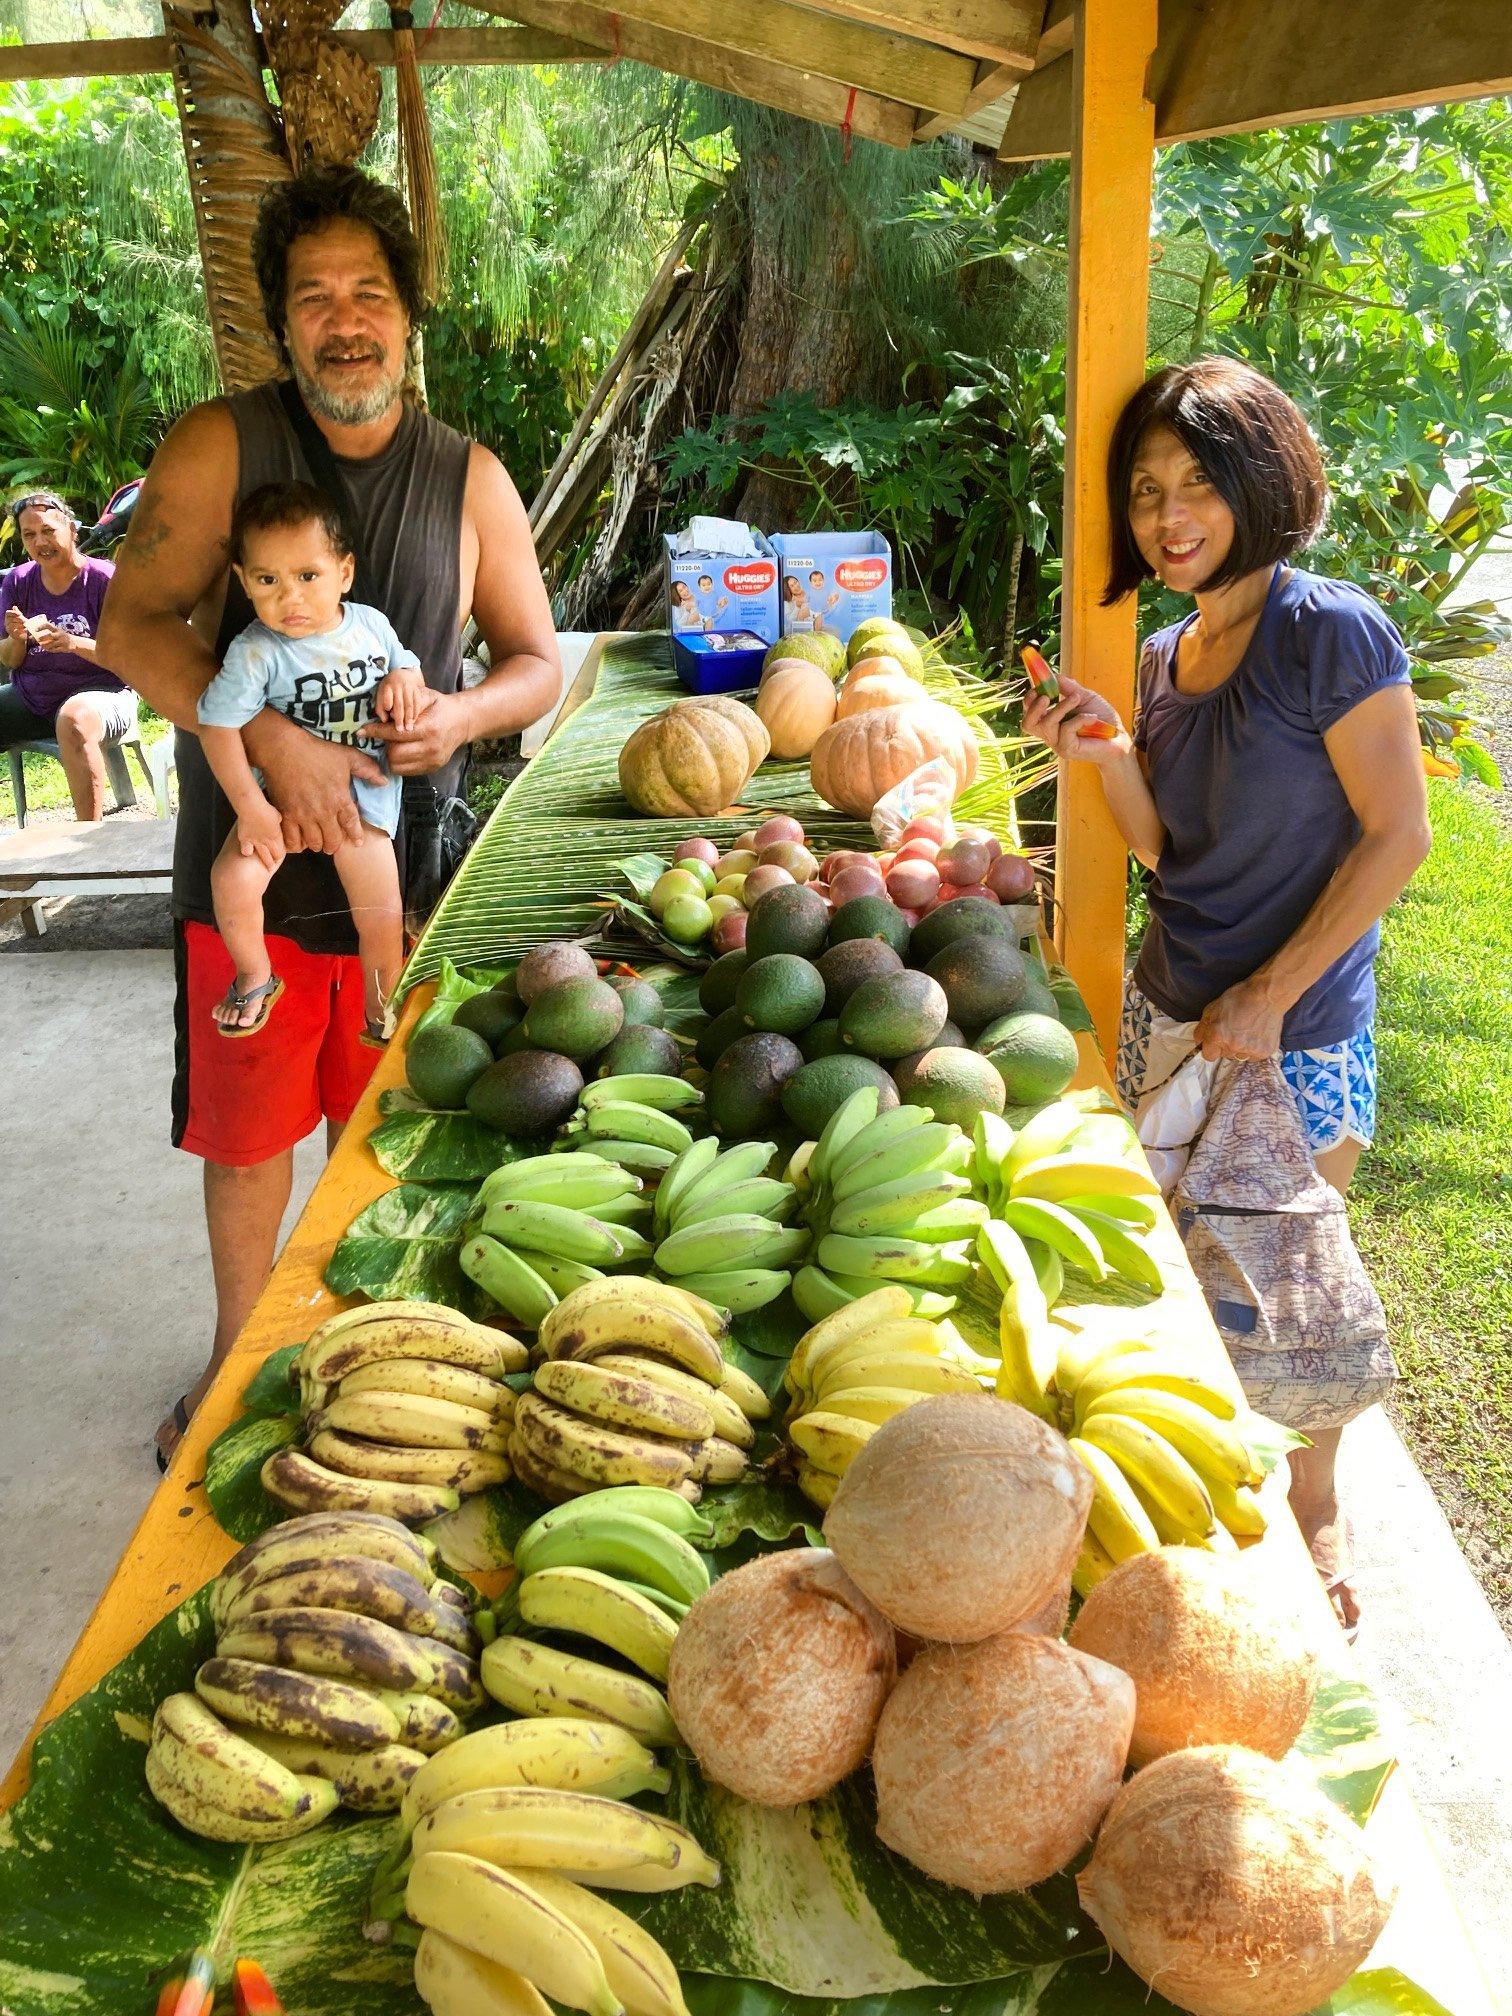 A roadside fruit stall.